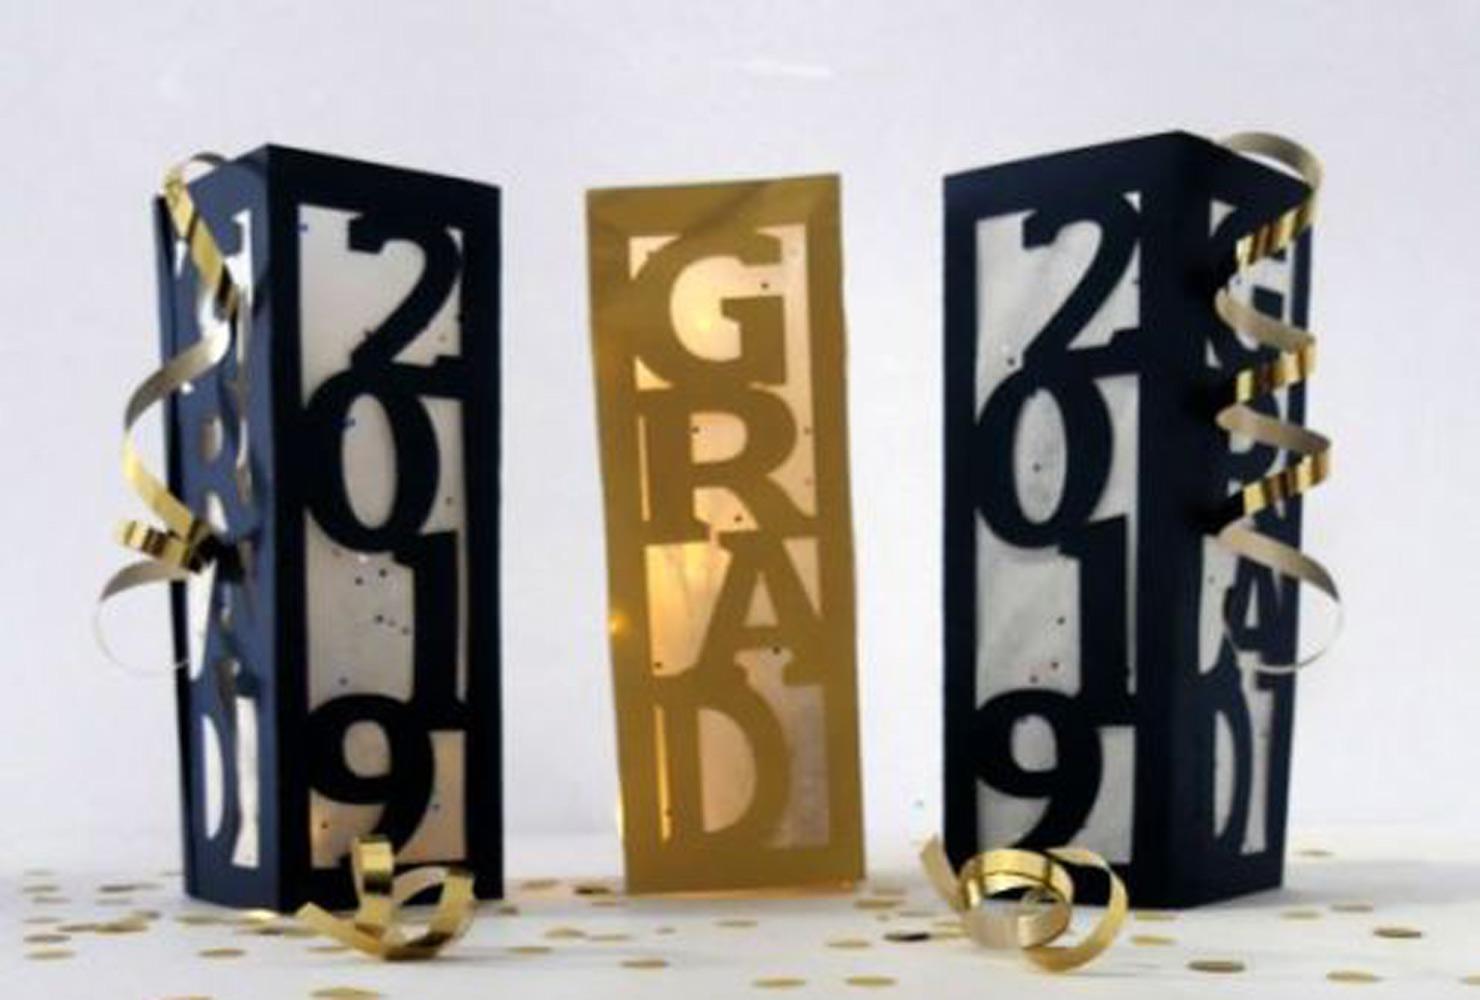 90 graduation party ideas